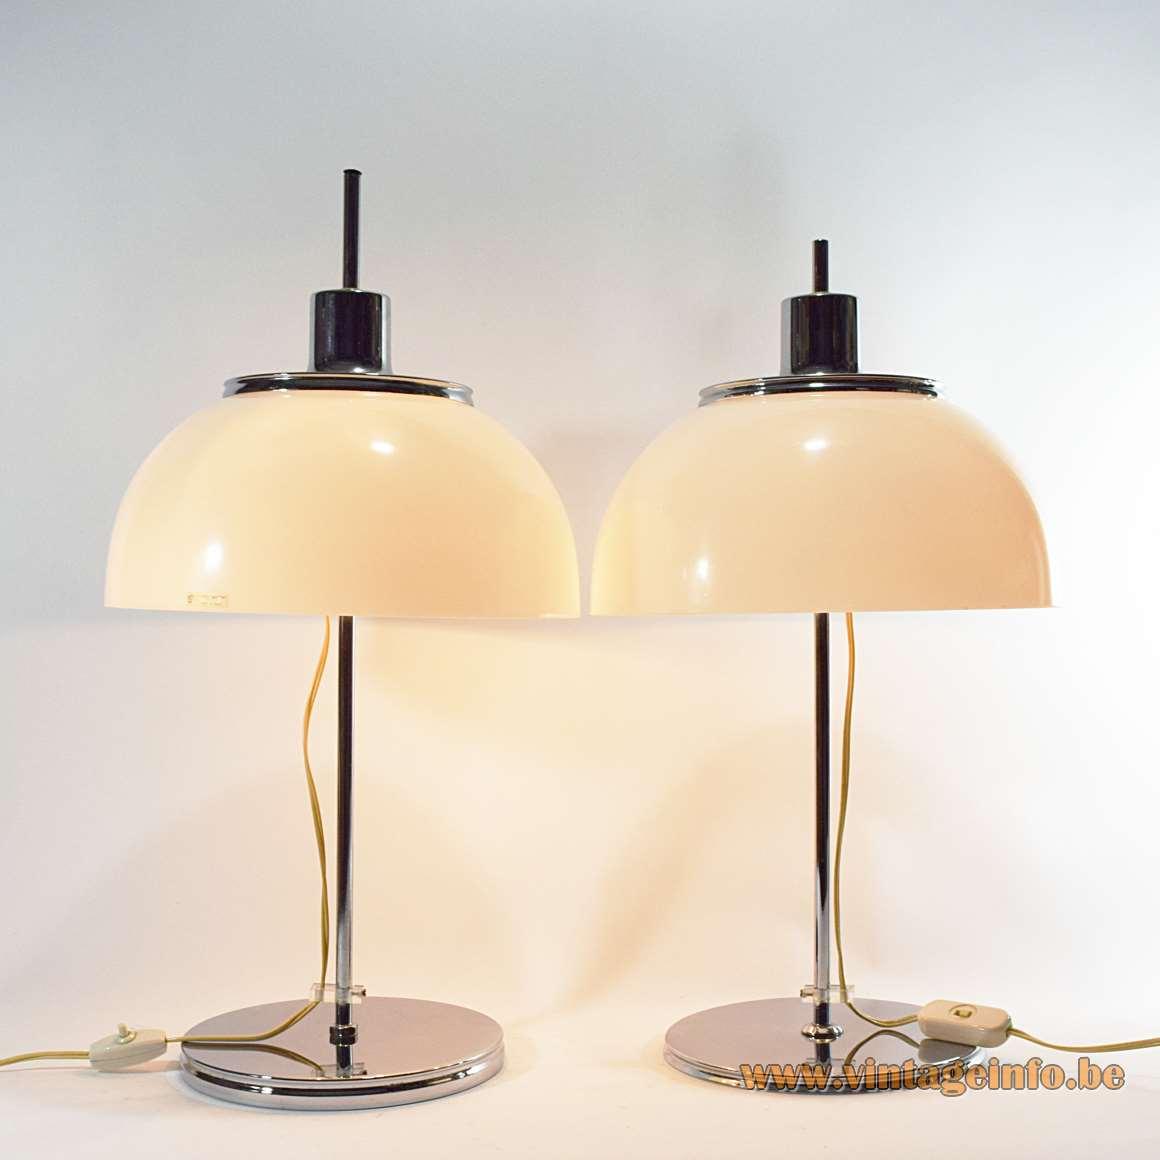 Harvey Guzzini Faro table lamps white acrylic mushroom lampshade chrome flat round base & rod 1970s Italy